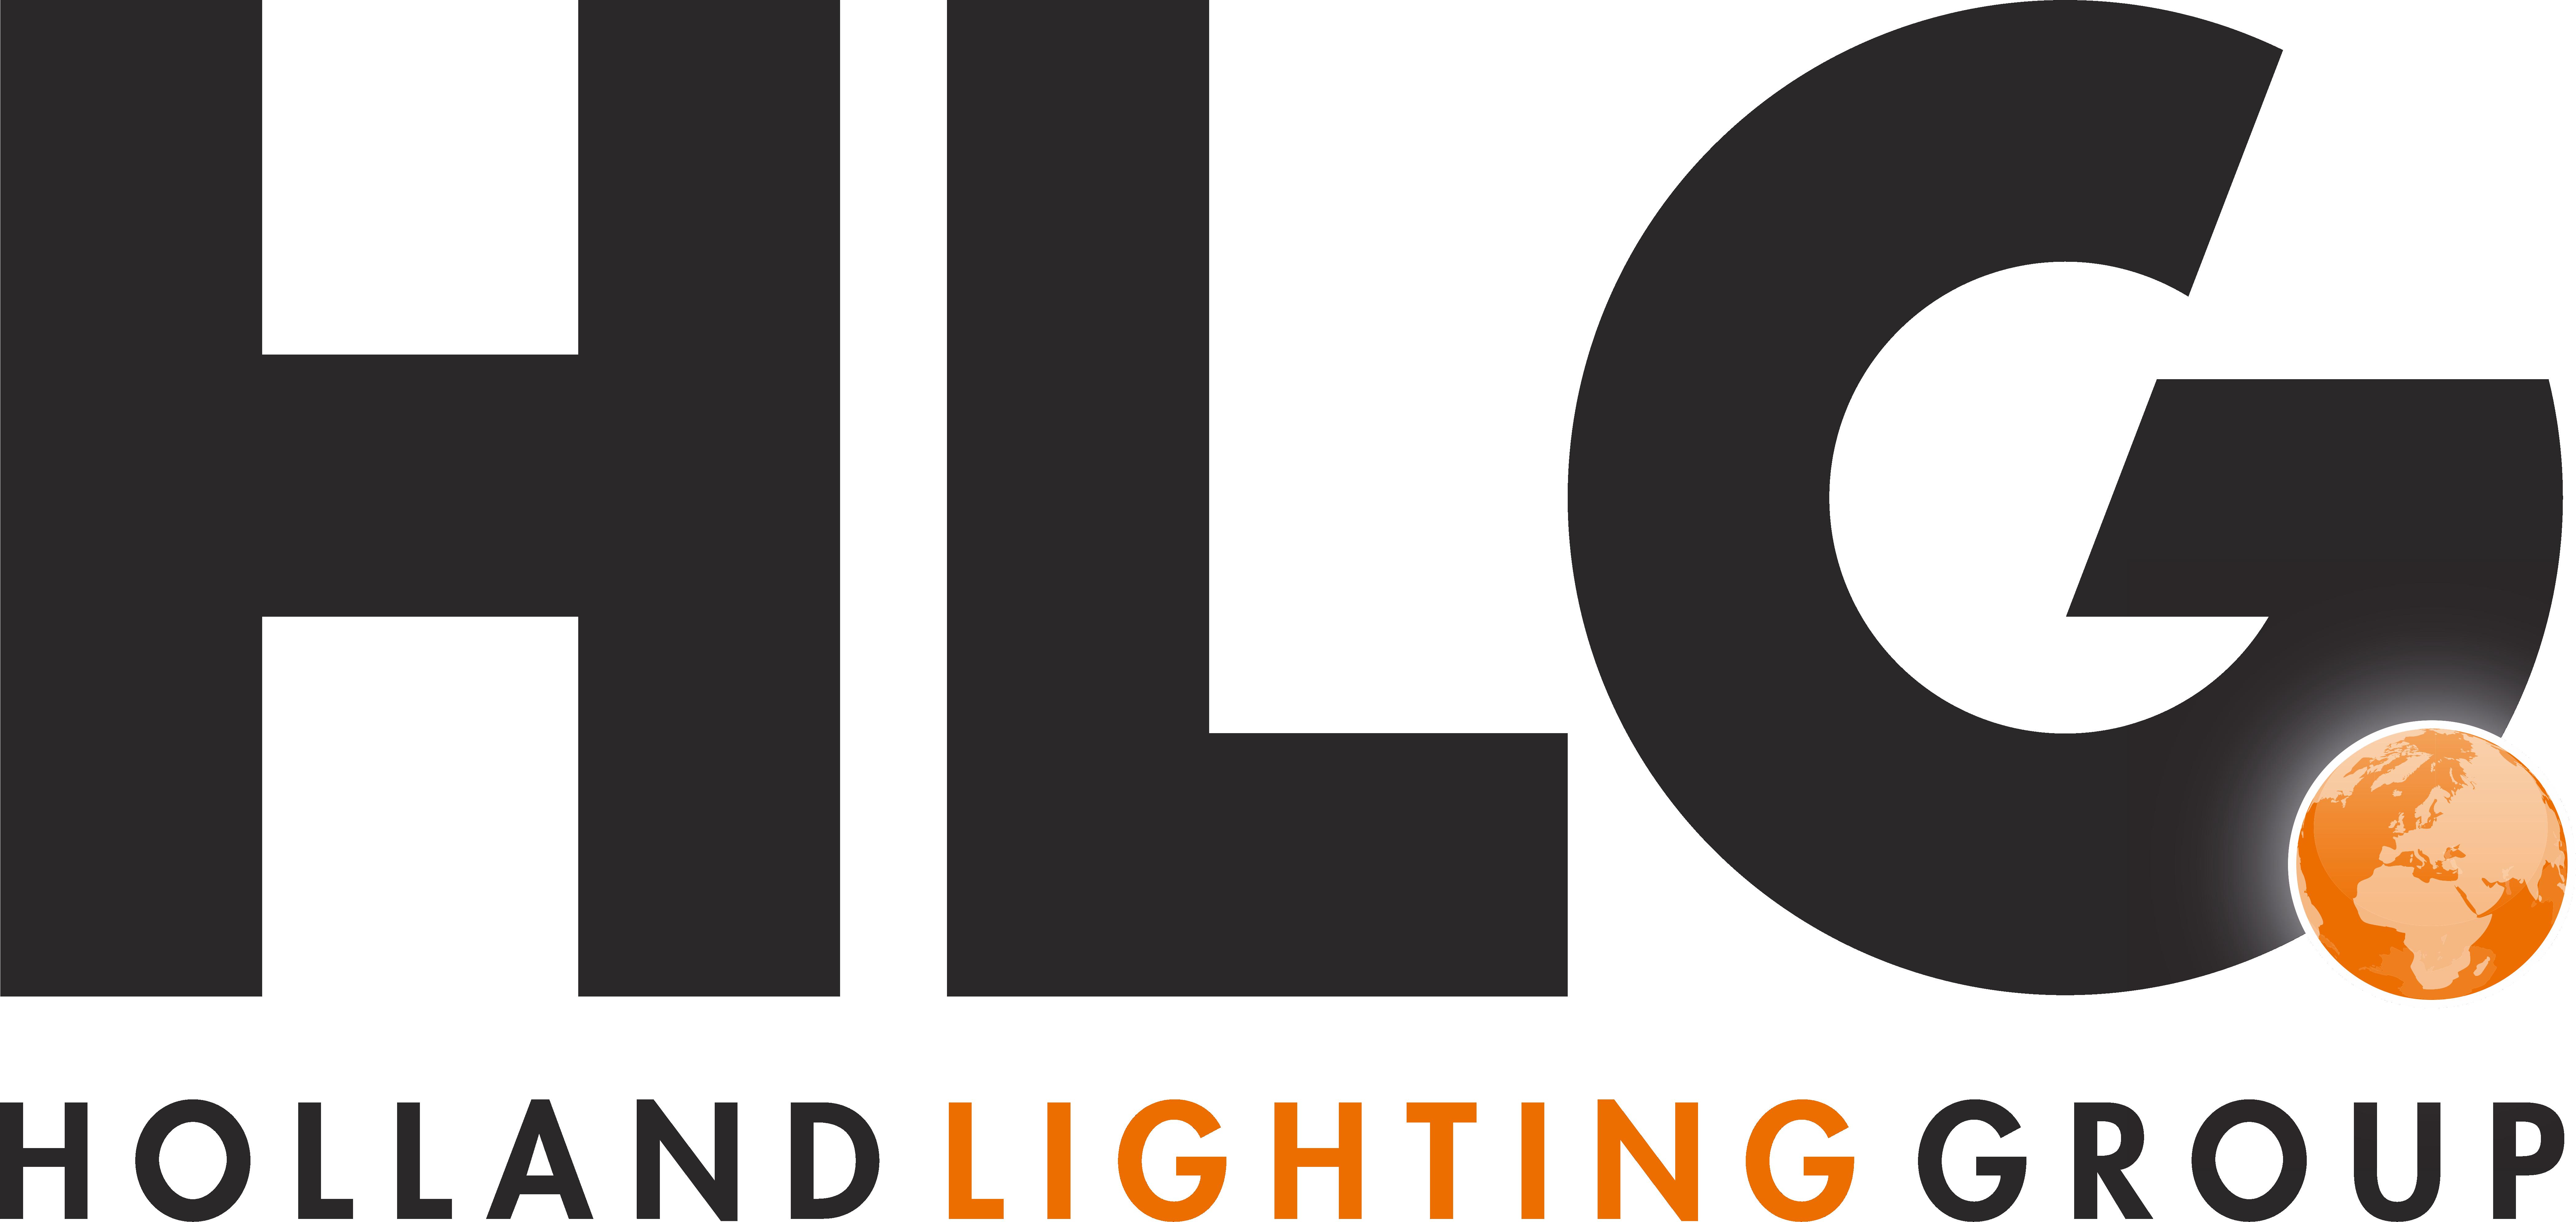 Holland Lighting Group B.V.